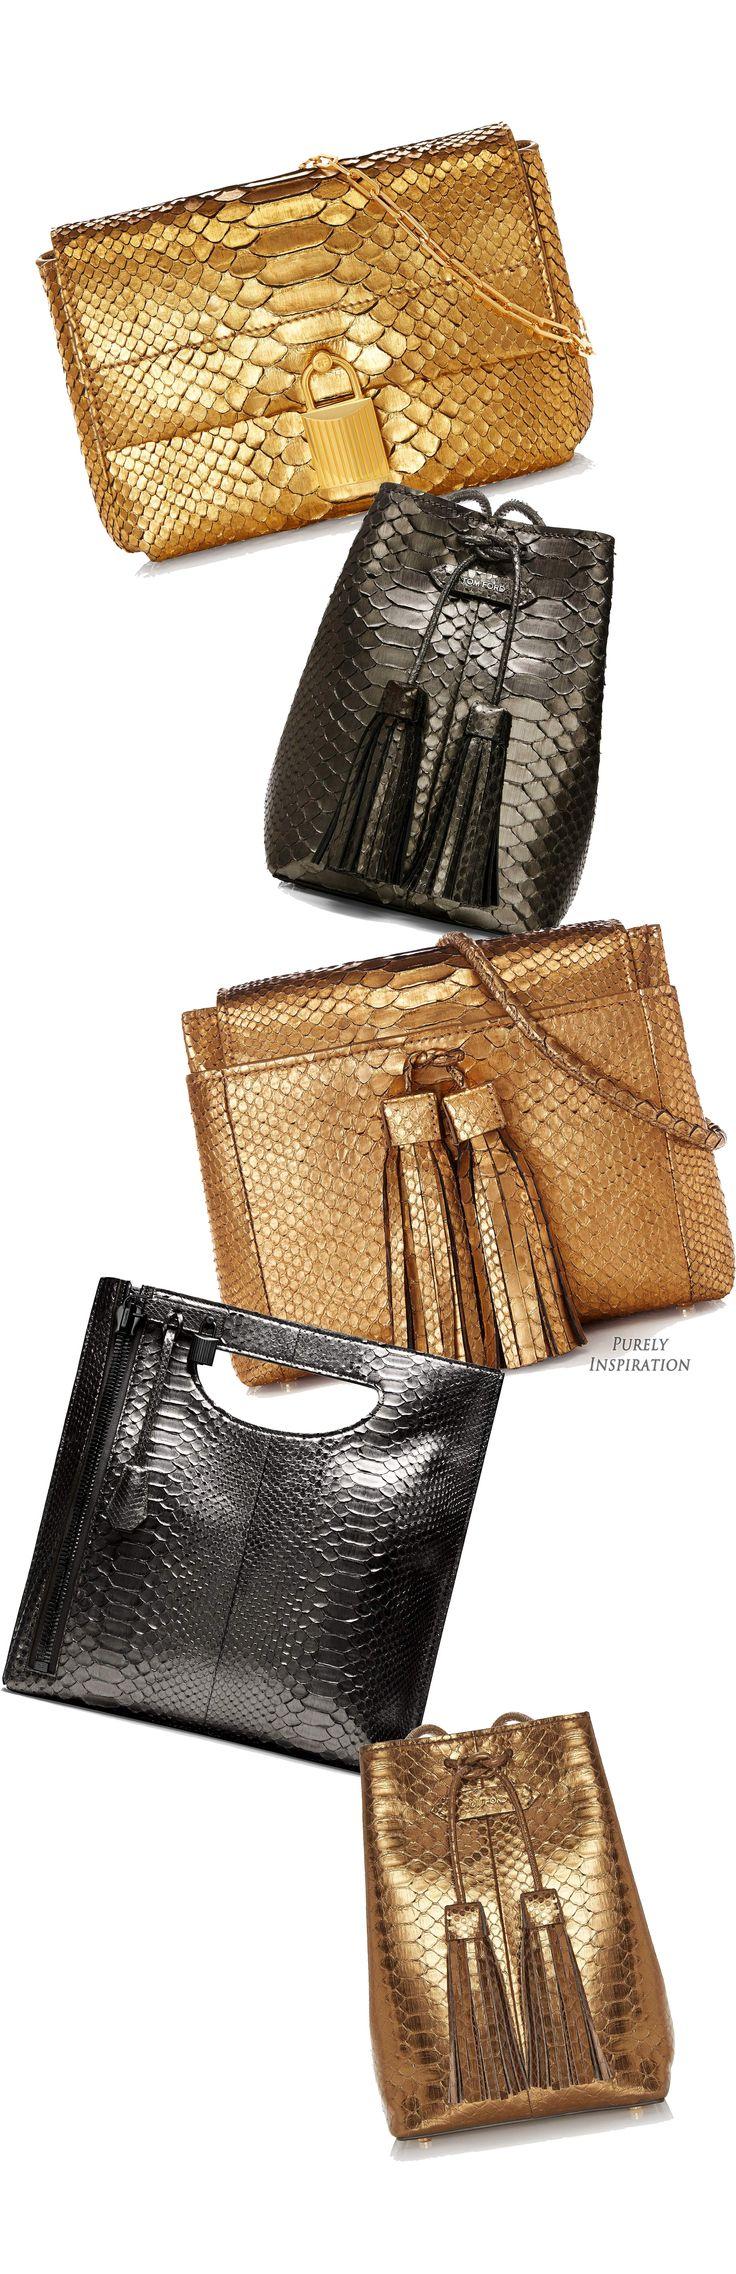 Tom Ford FW2015 metallic leather handbags | Purely Inspiration